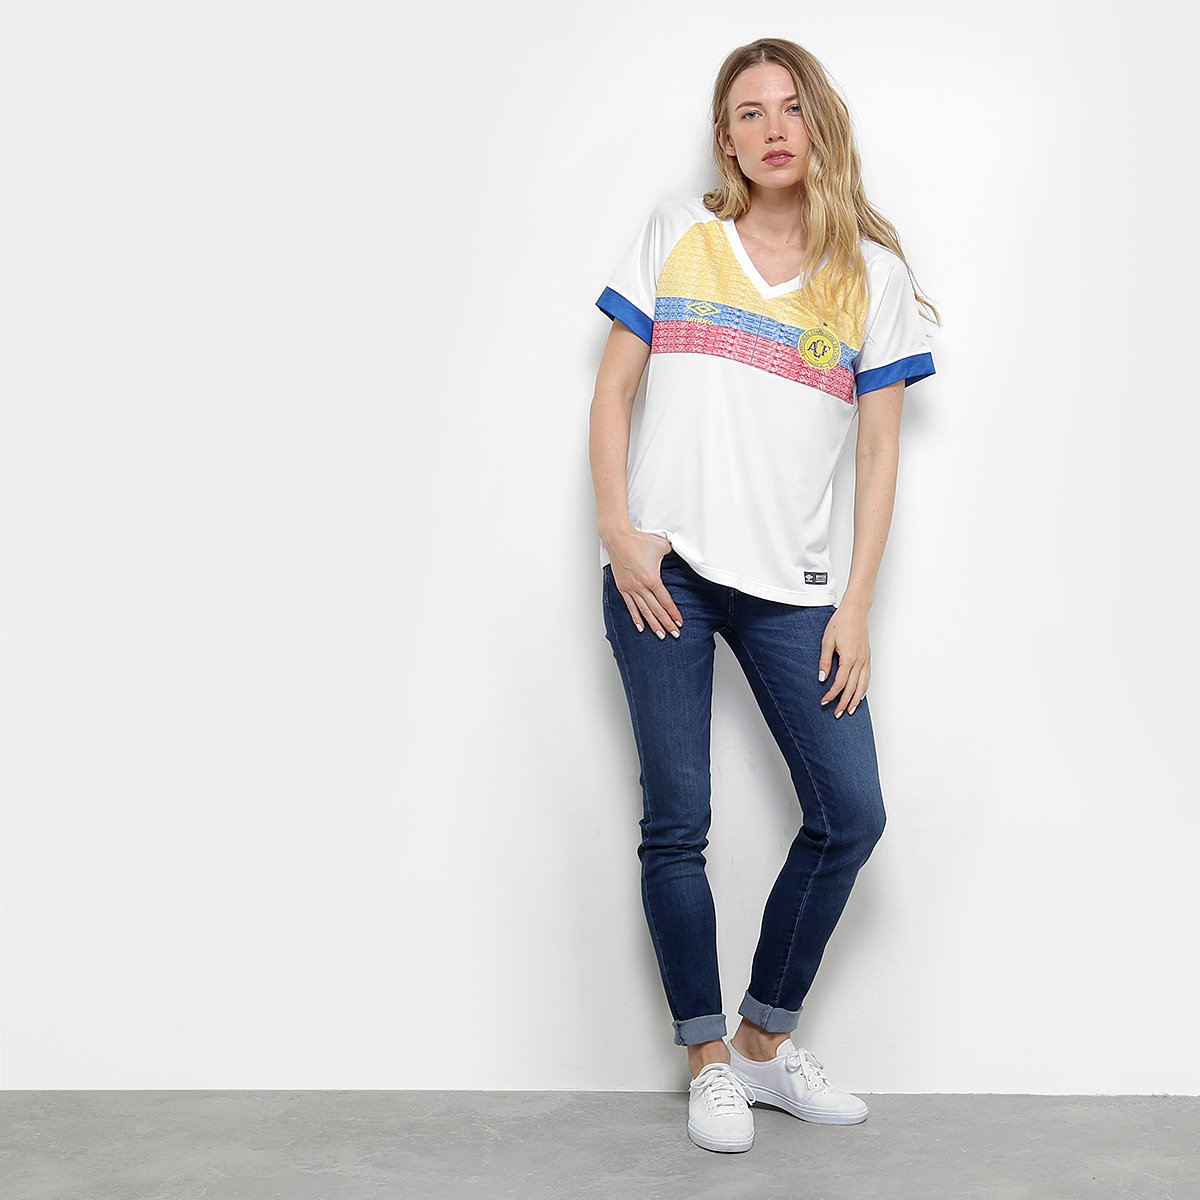 Branco La s II Chapecoense e Torcedor 2018 Azul Camisa n° Pasion Umbro Feminina XvZqwx